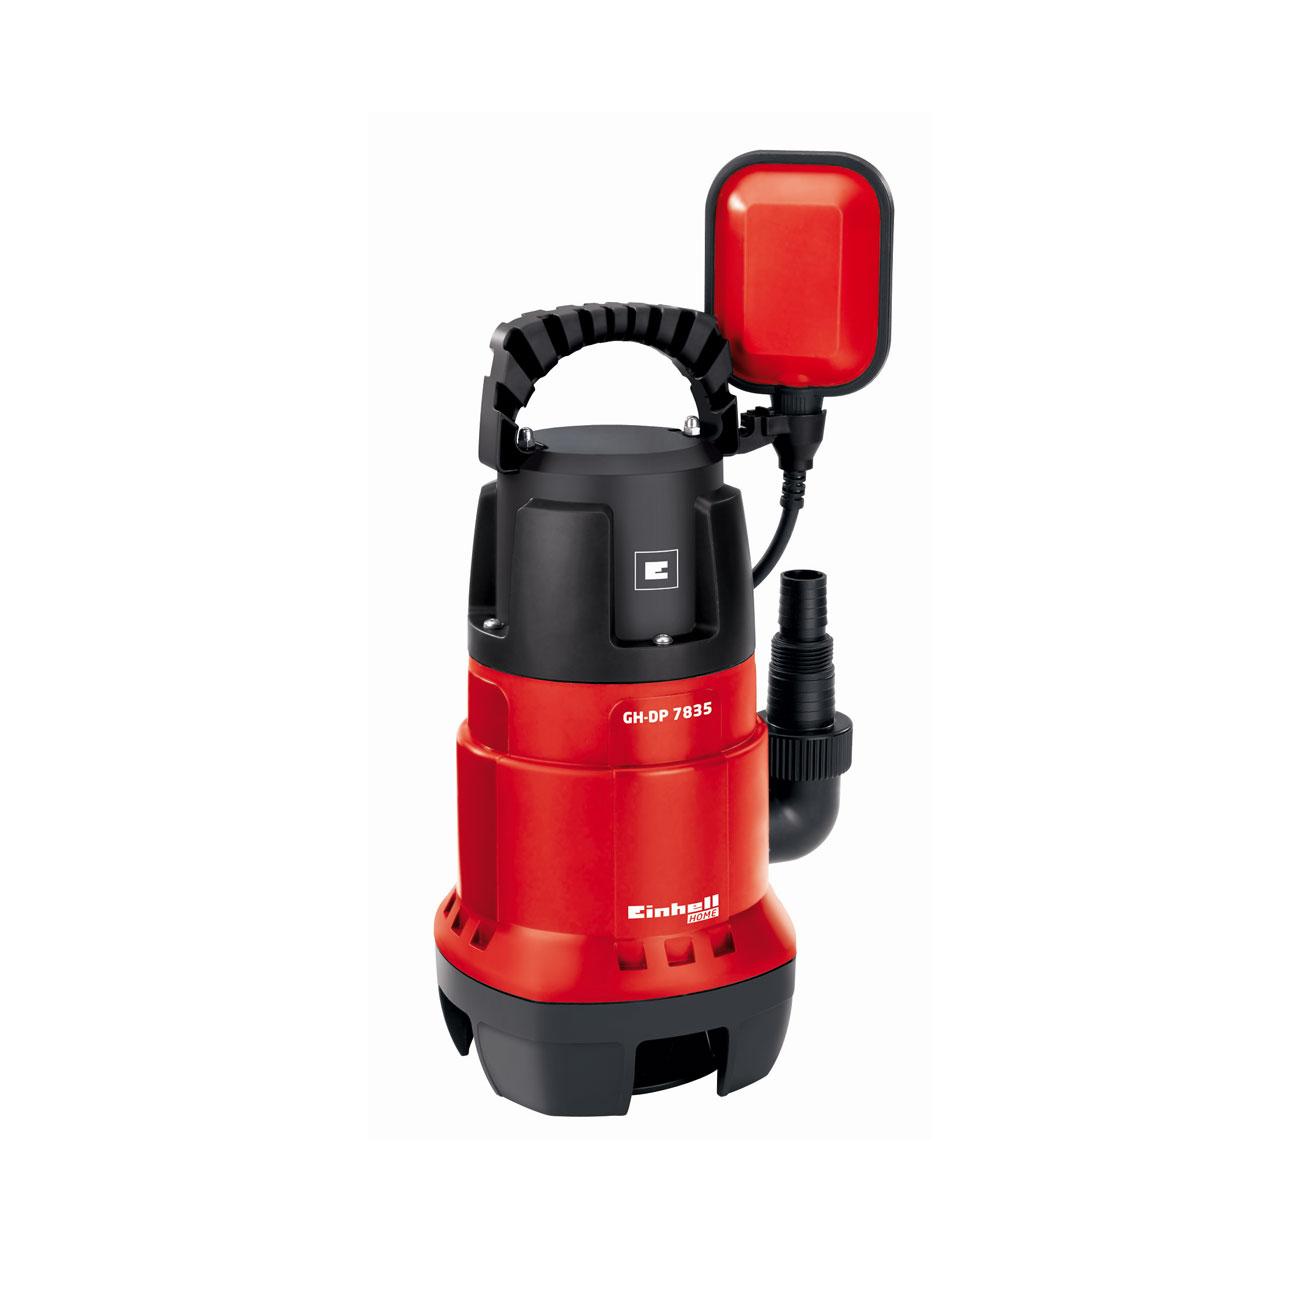 Einhell GH-DP 7835 Submersible Dirty Water Pump